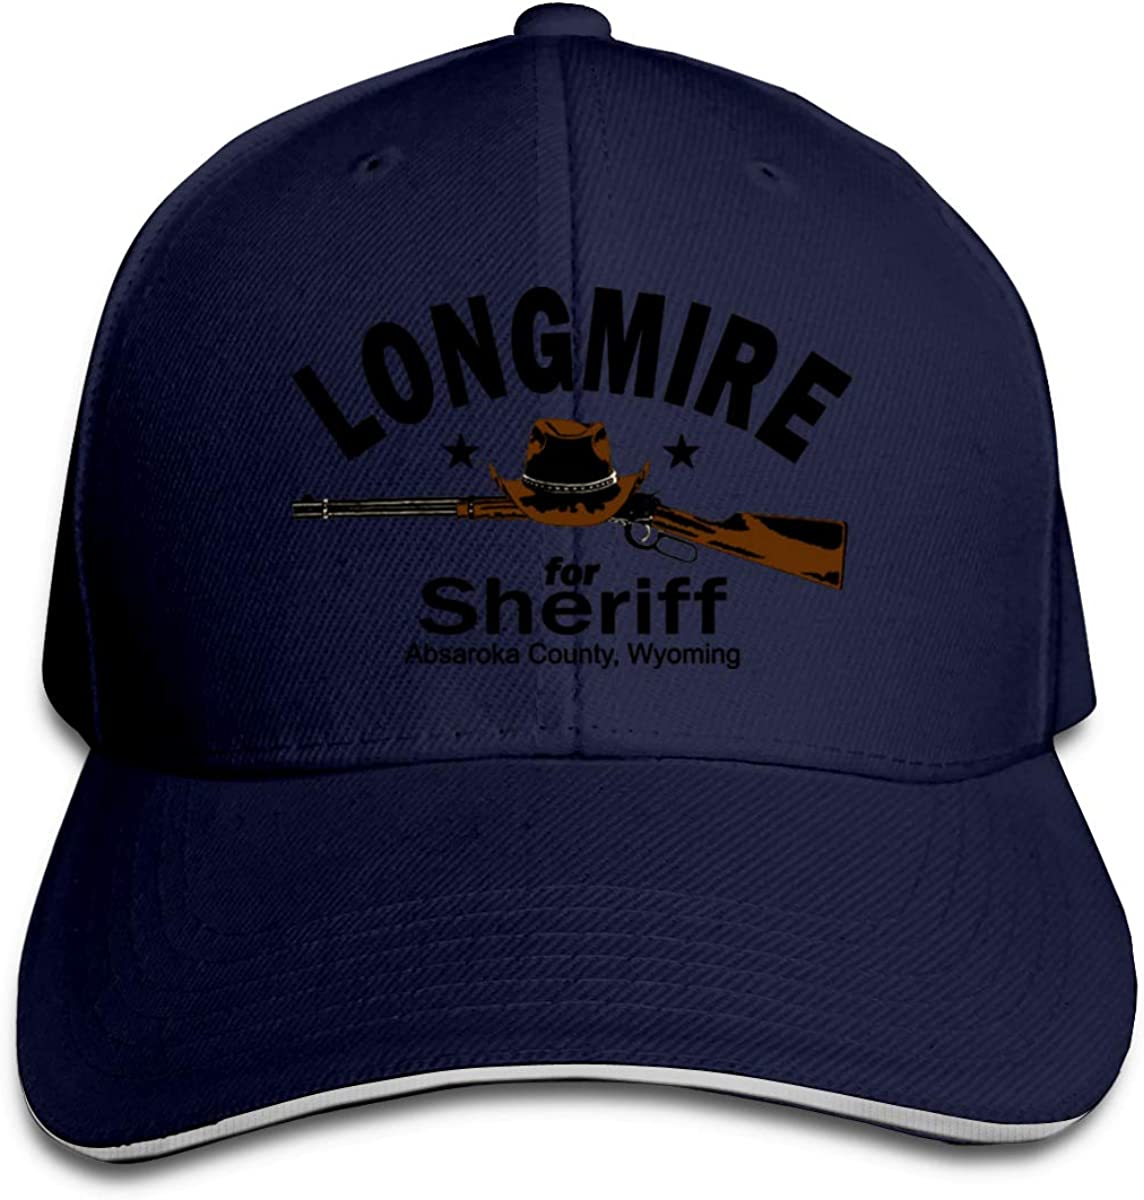 YUSOO Adult Unisex Casual Style Longmire for Sheriff Adjustable Sandwich Baseball Cap for Men's&Womens